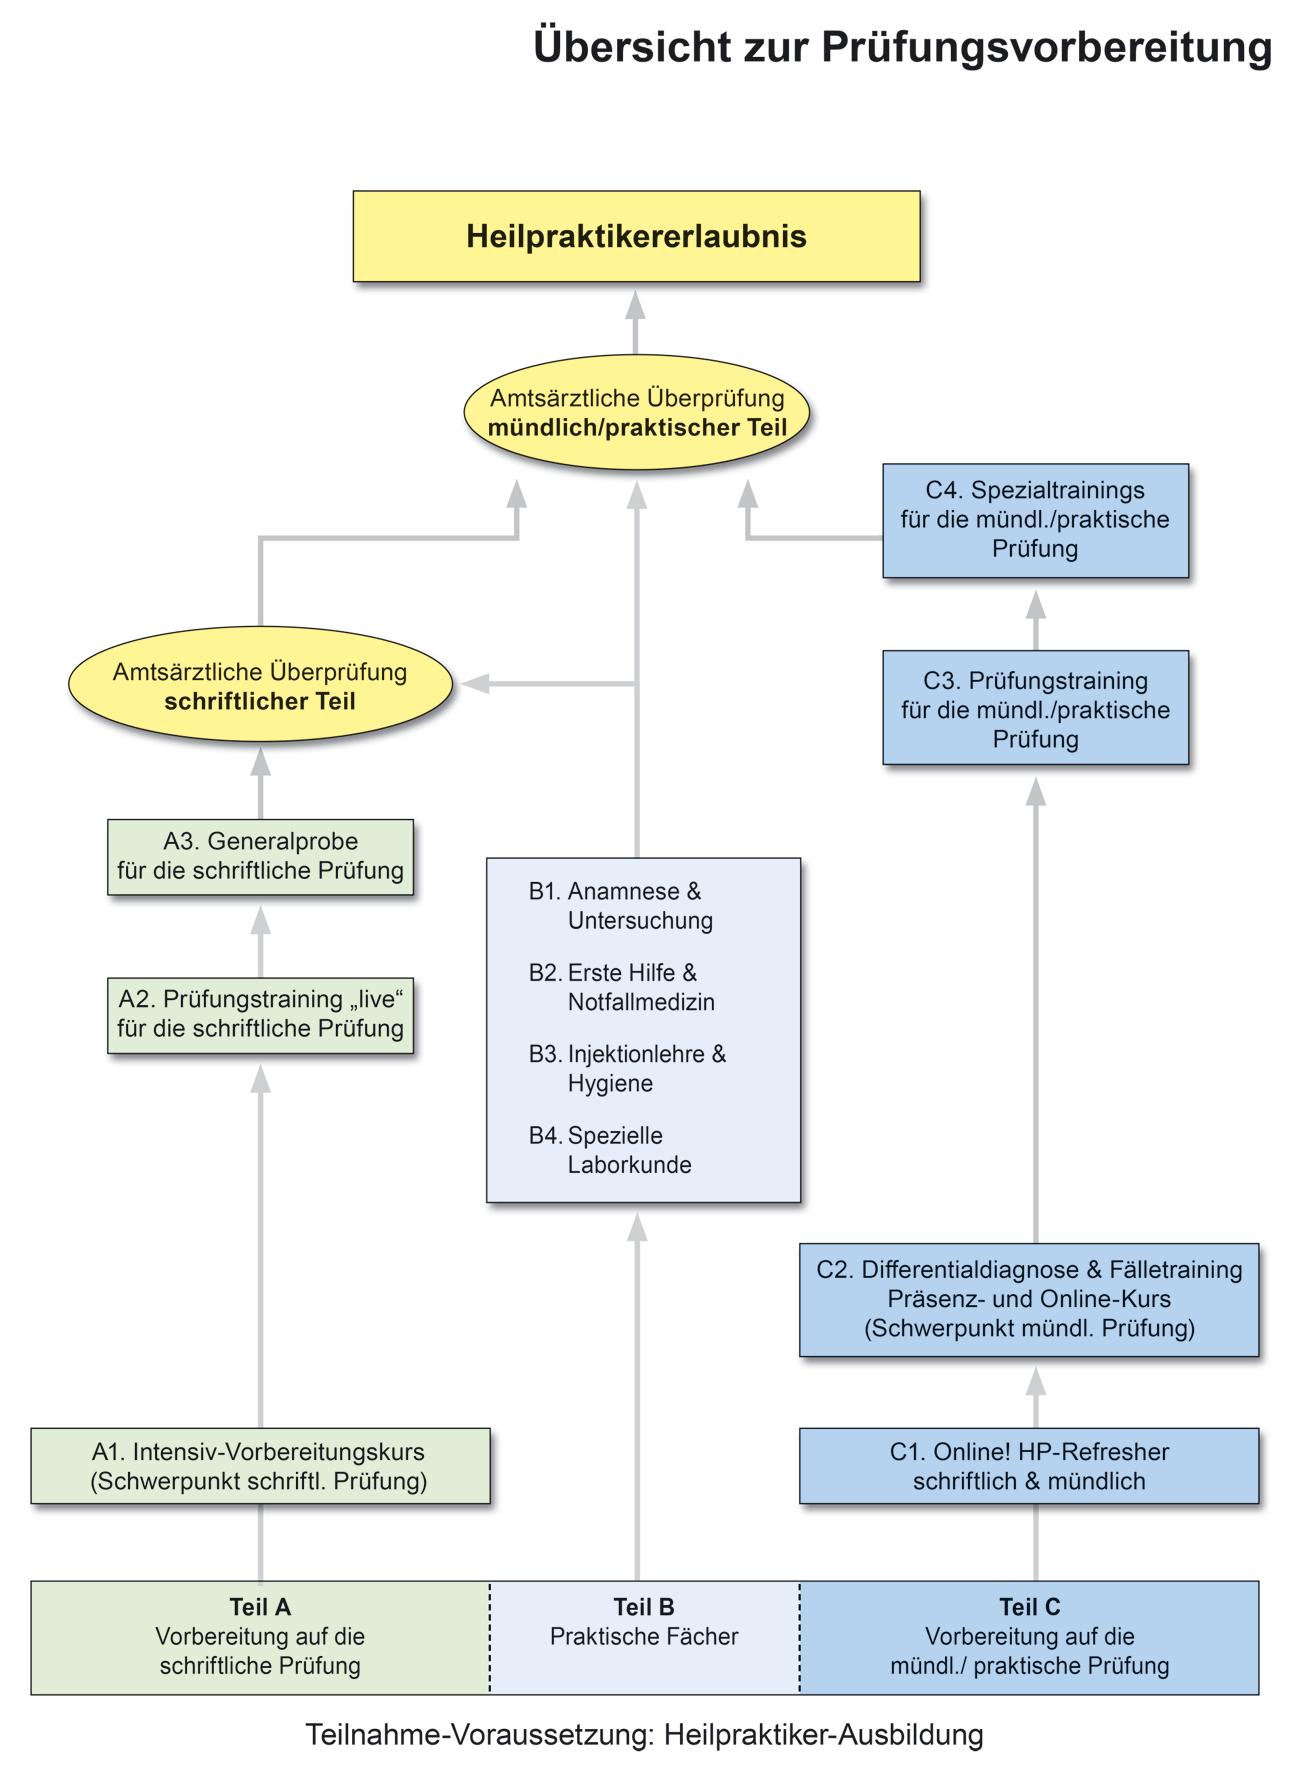 Uebersicht Pruefungsvorbereitung Heilpraktiker 1314x1769px 2021